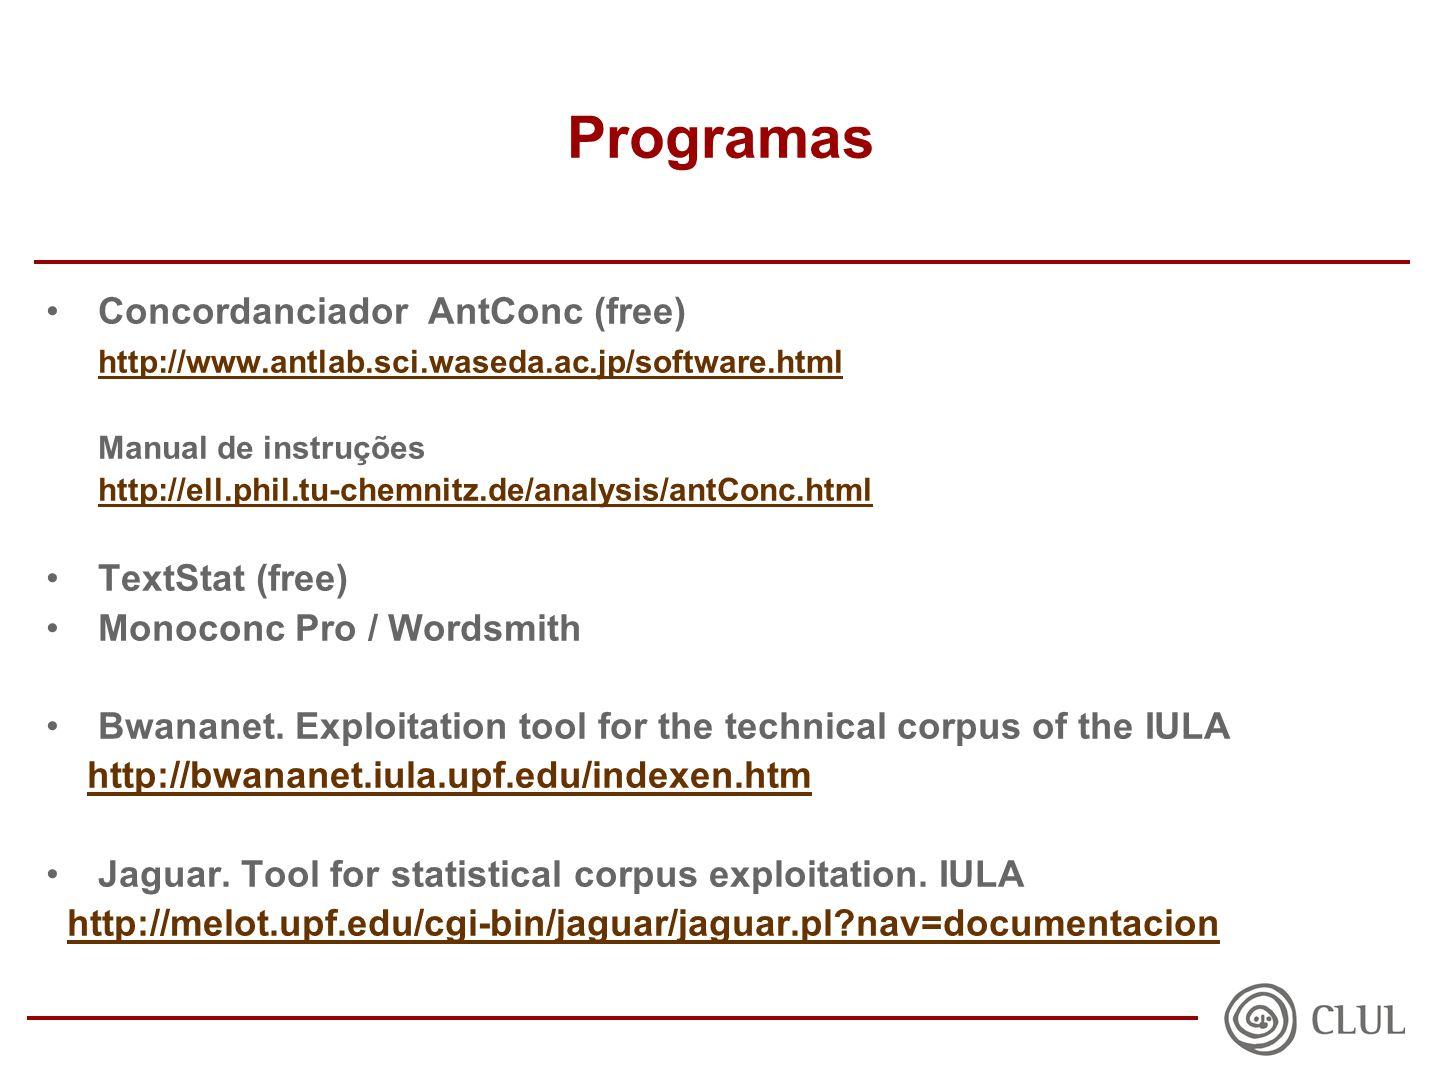 Programas Concordanciador AntConc (free) http://www.antlab.sci.waseda.ac.jp/software.html Manual de instruções http://ell.phil.tu-chemnitz.de/analysis/antConc.html TextStat (free) Monoconc Pro / Wordsmith Bwananet.